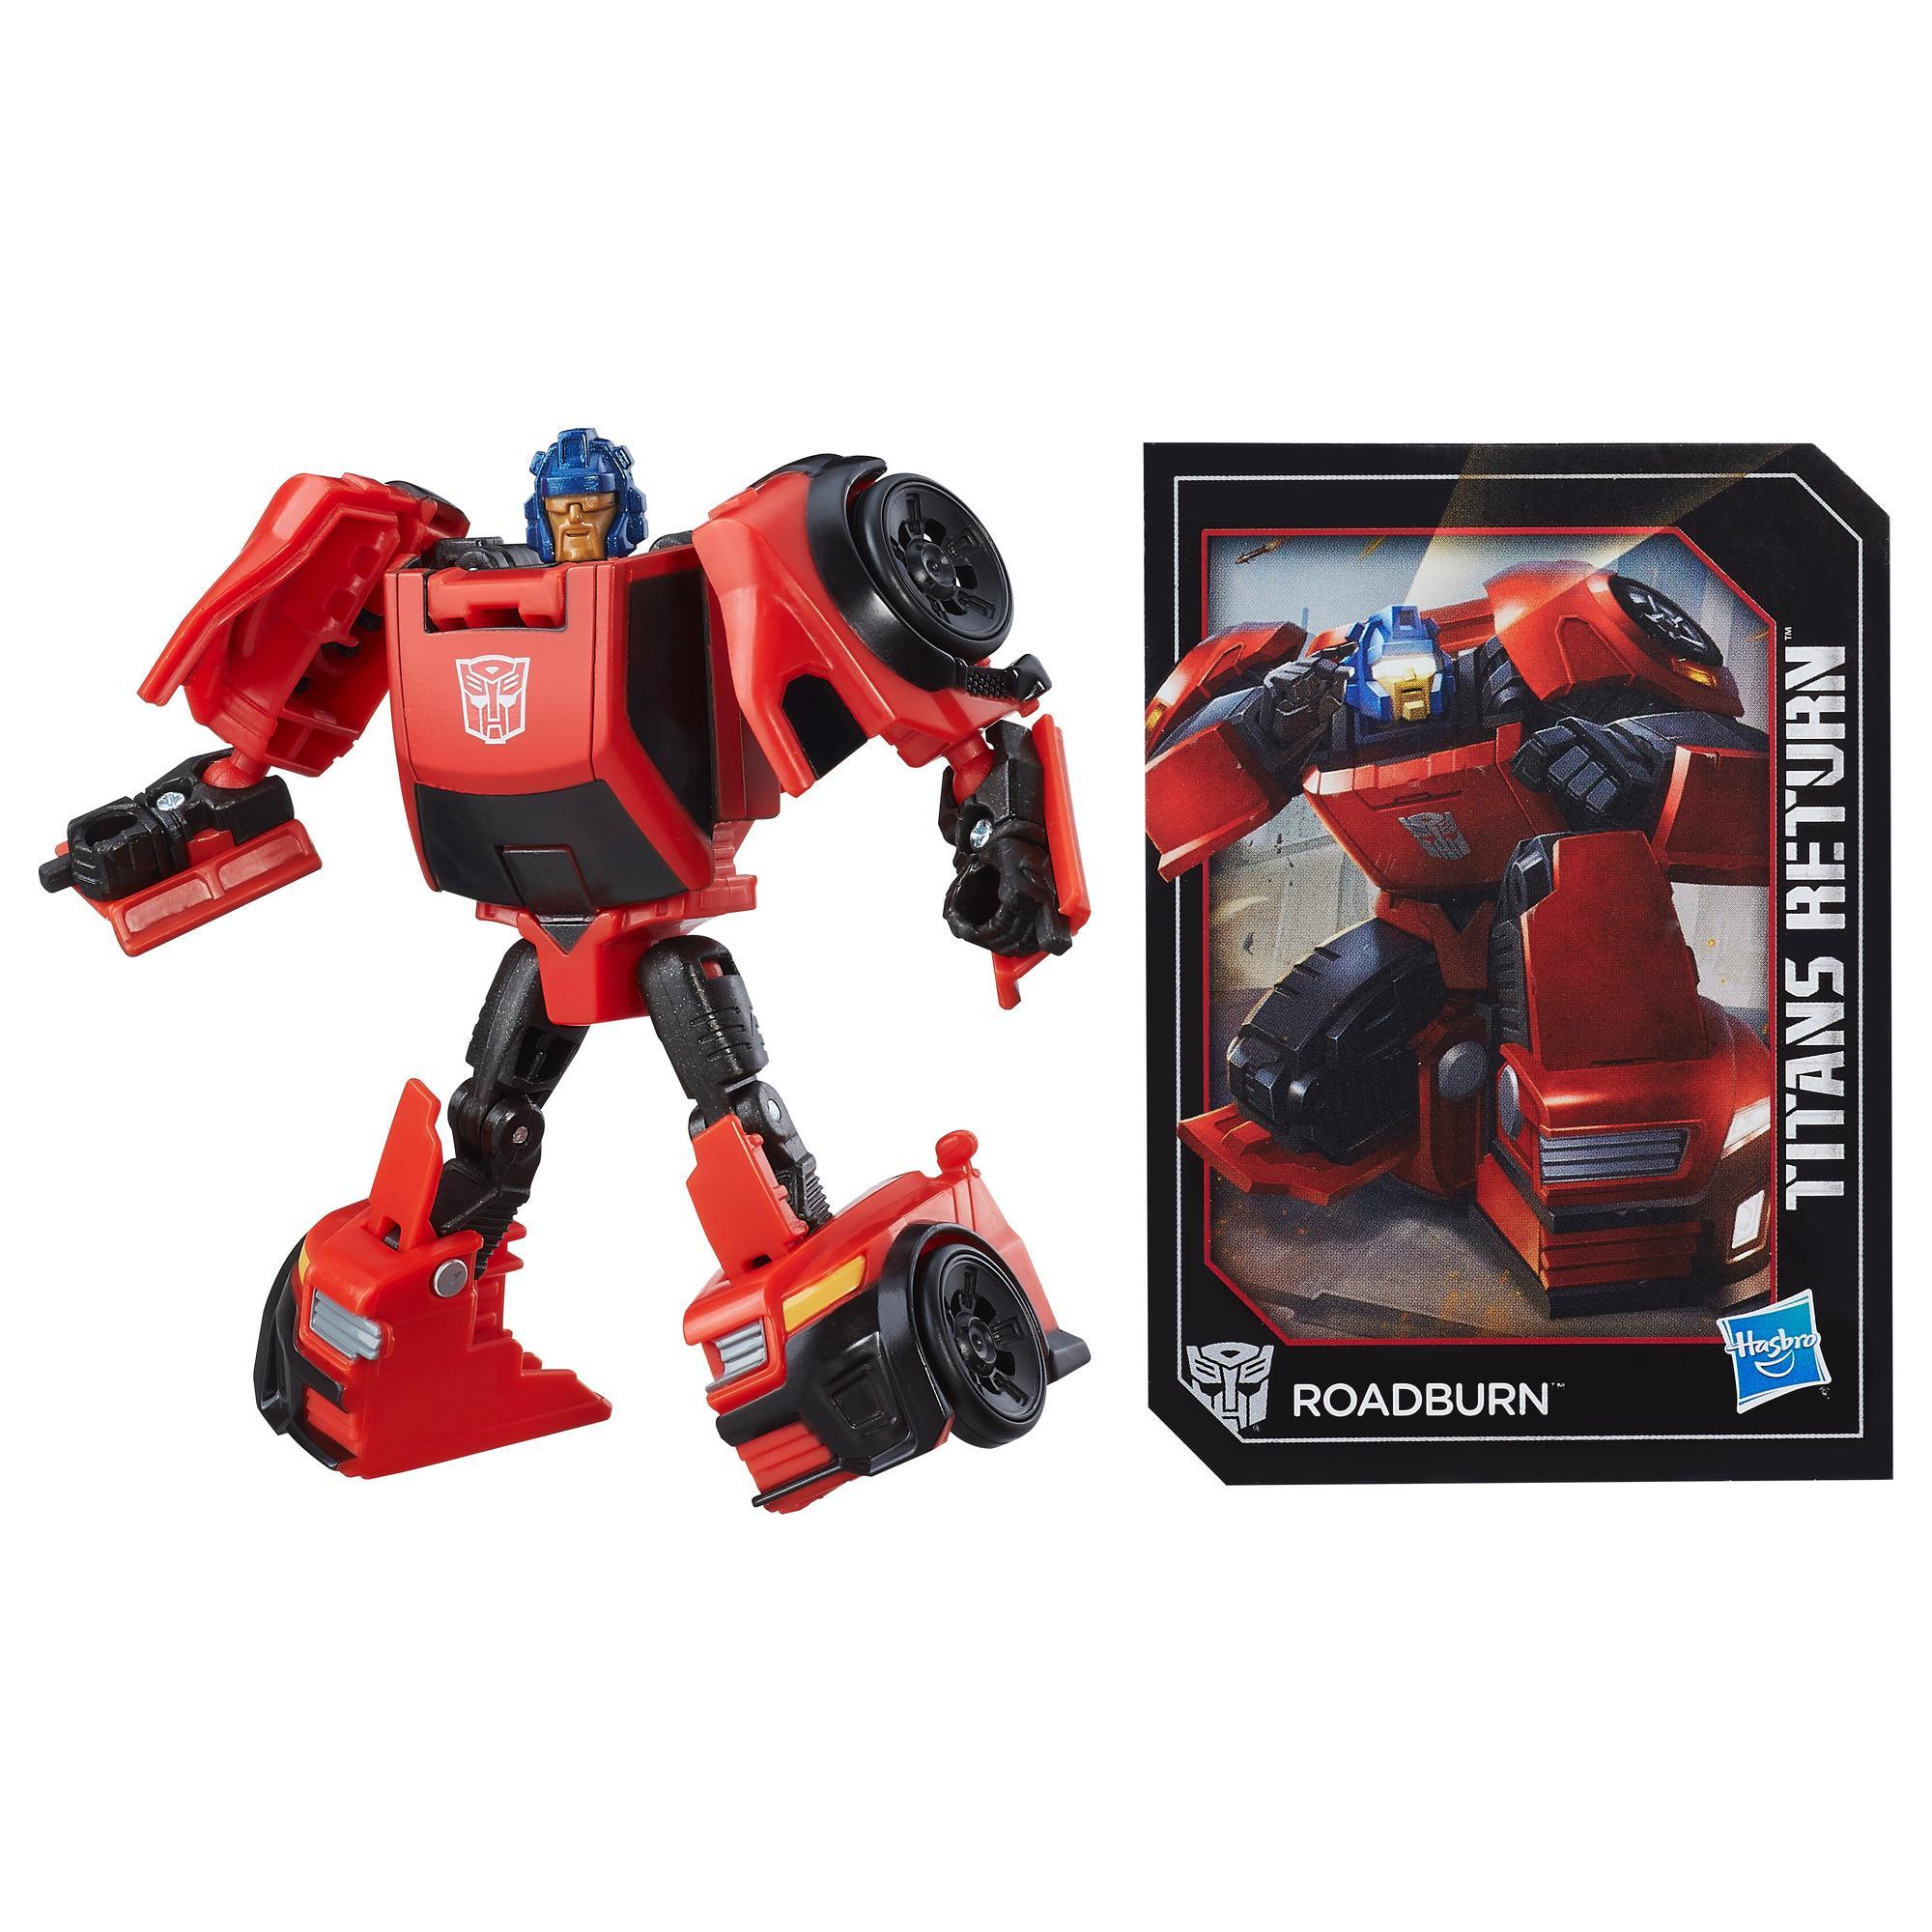 Transformers Generations Titans Return Legends Class Roadburn